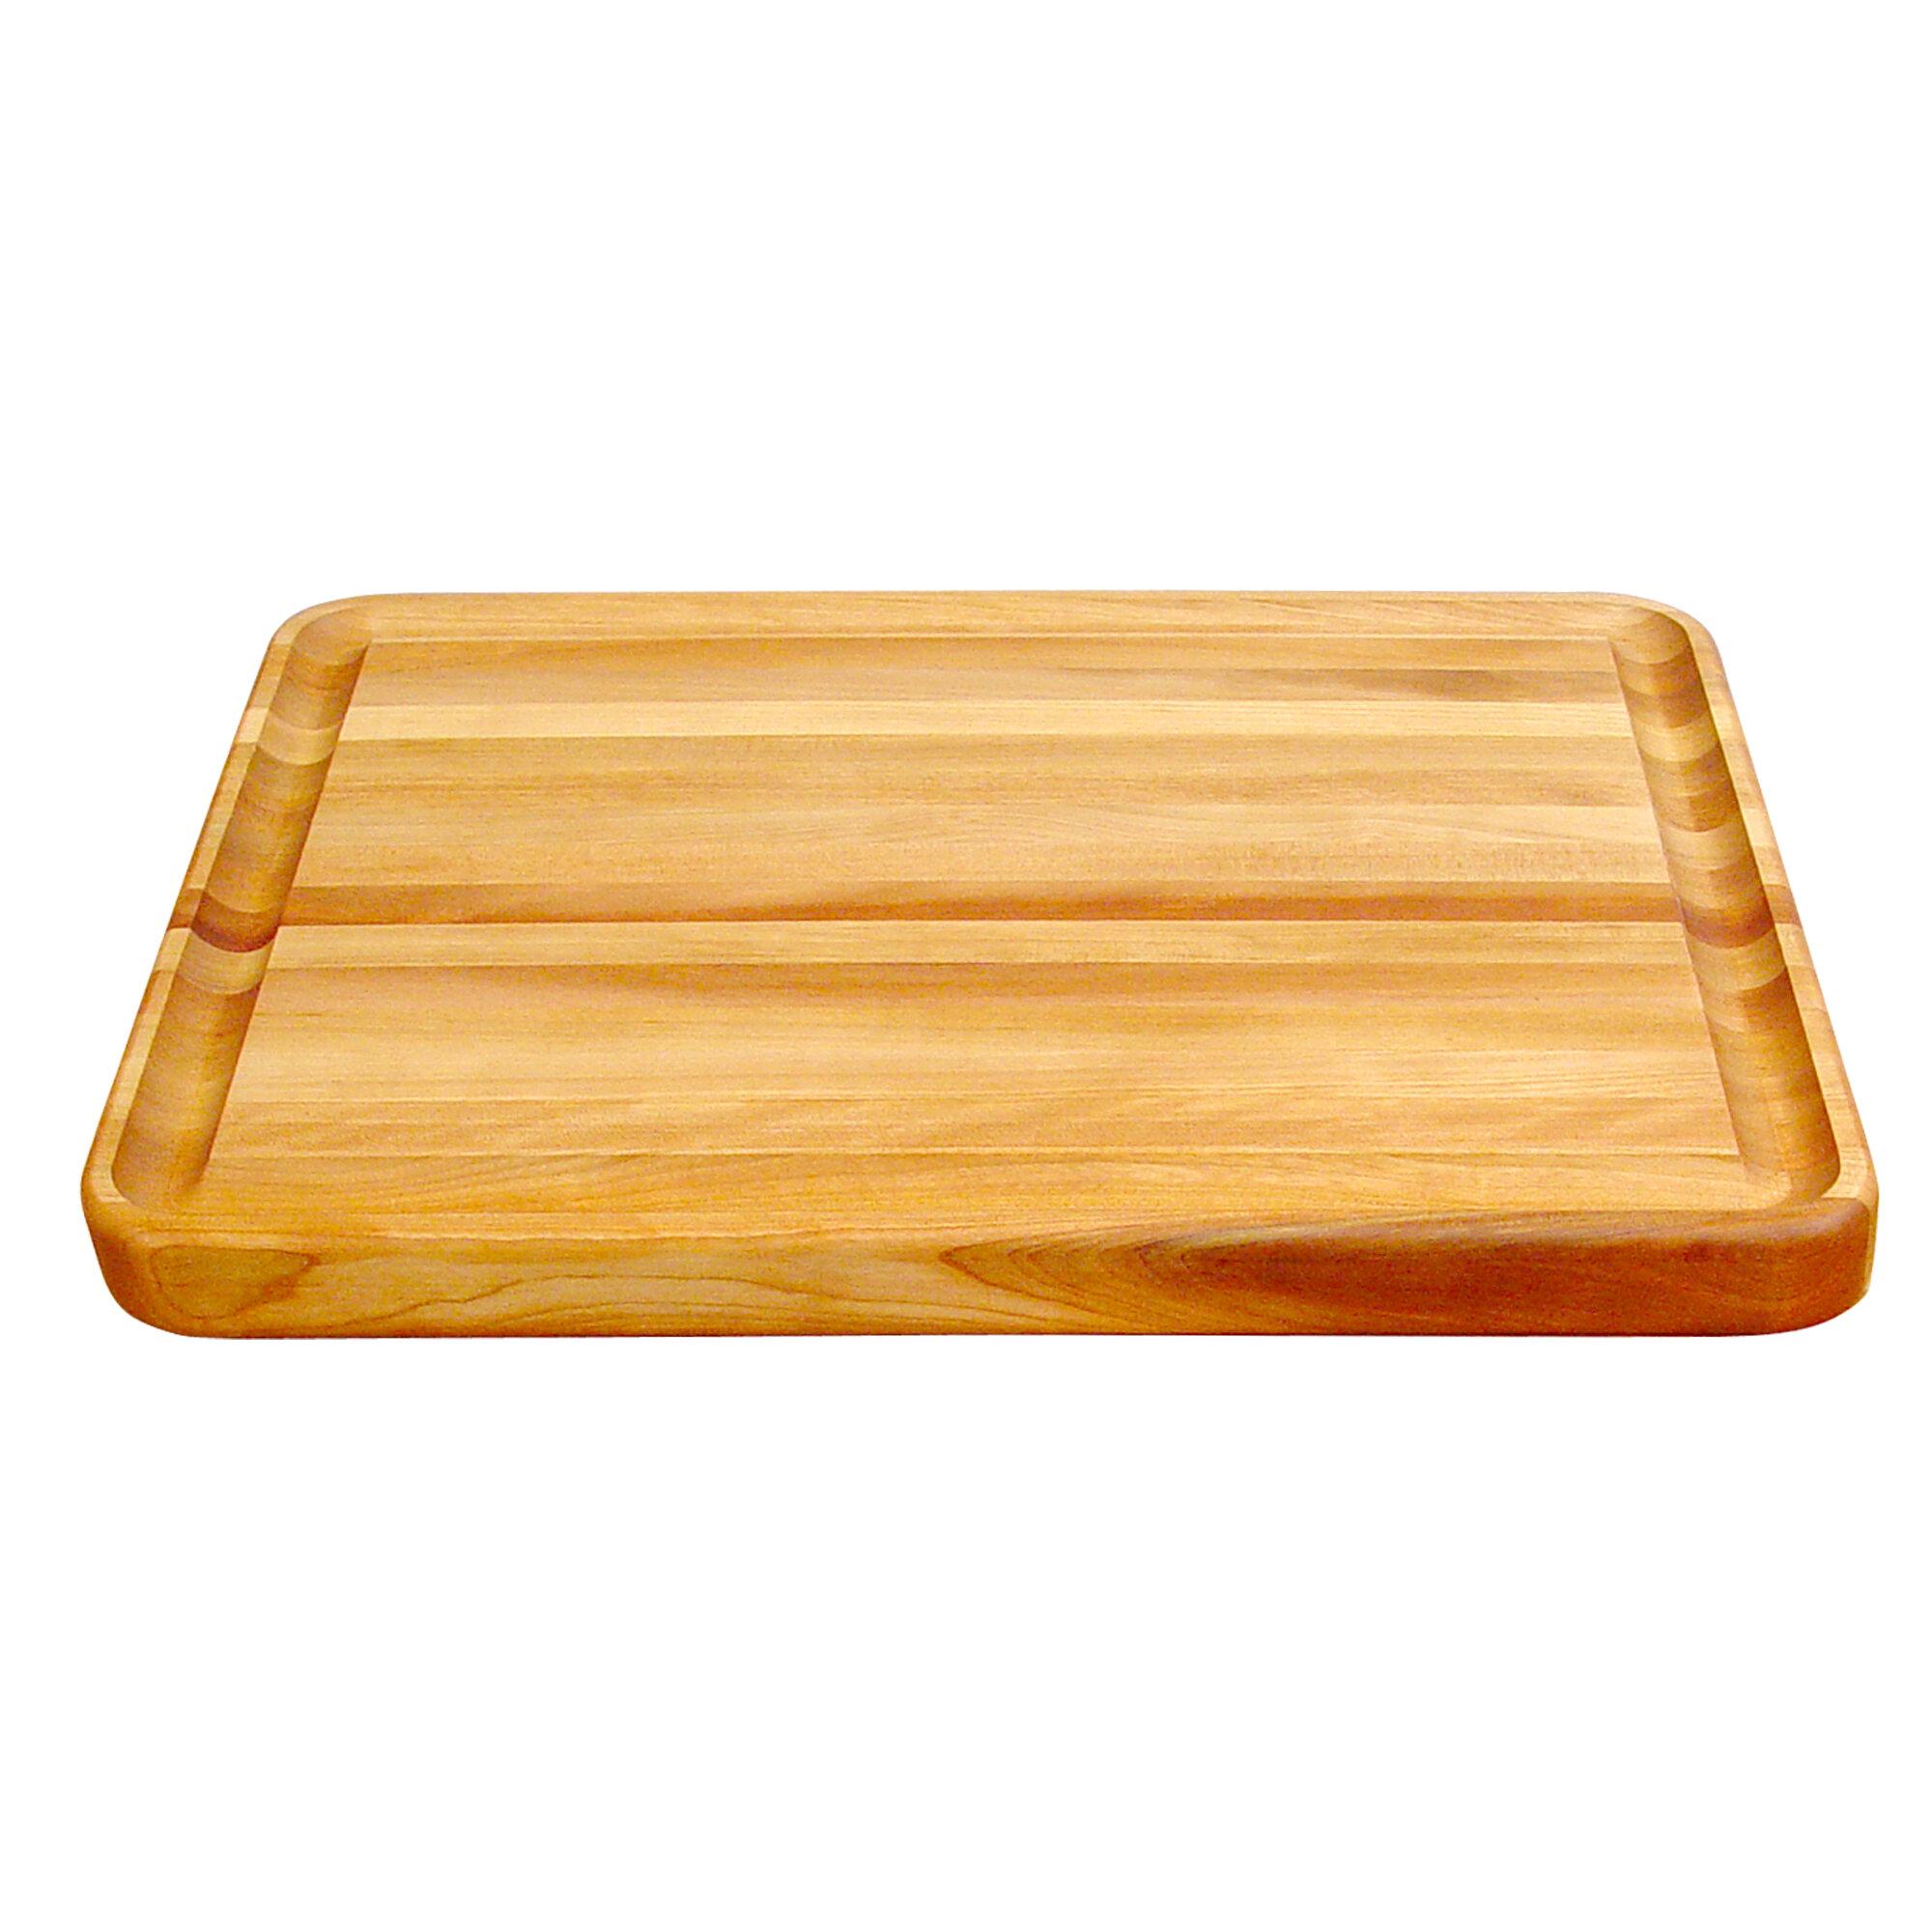 Catskill Craftsmen Inc Professional Style Wood Cutting Board Reviews Wayfair